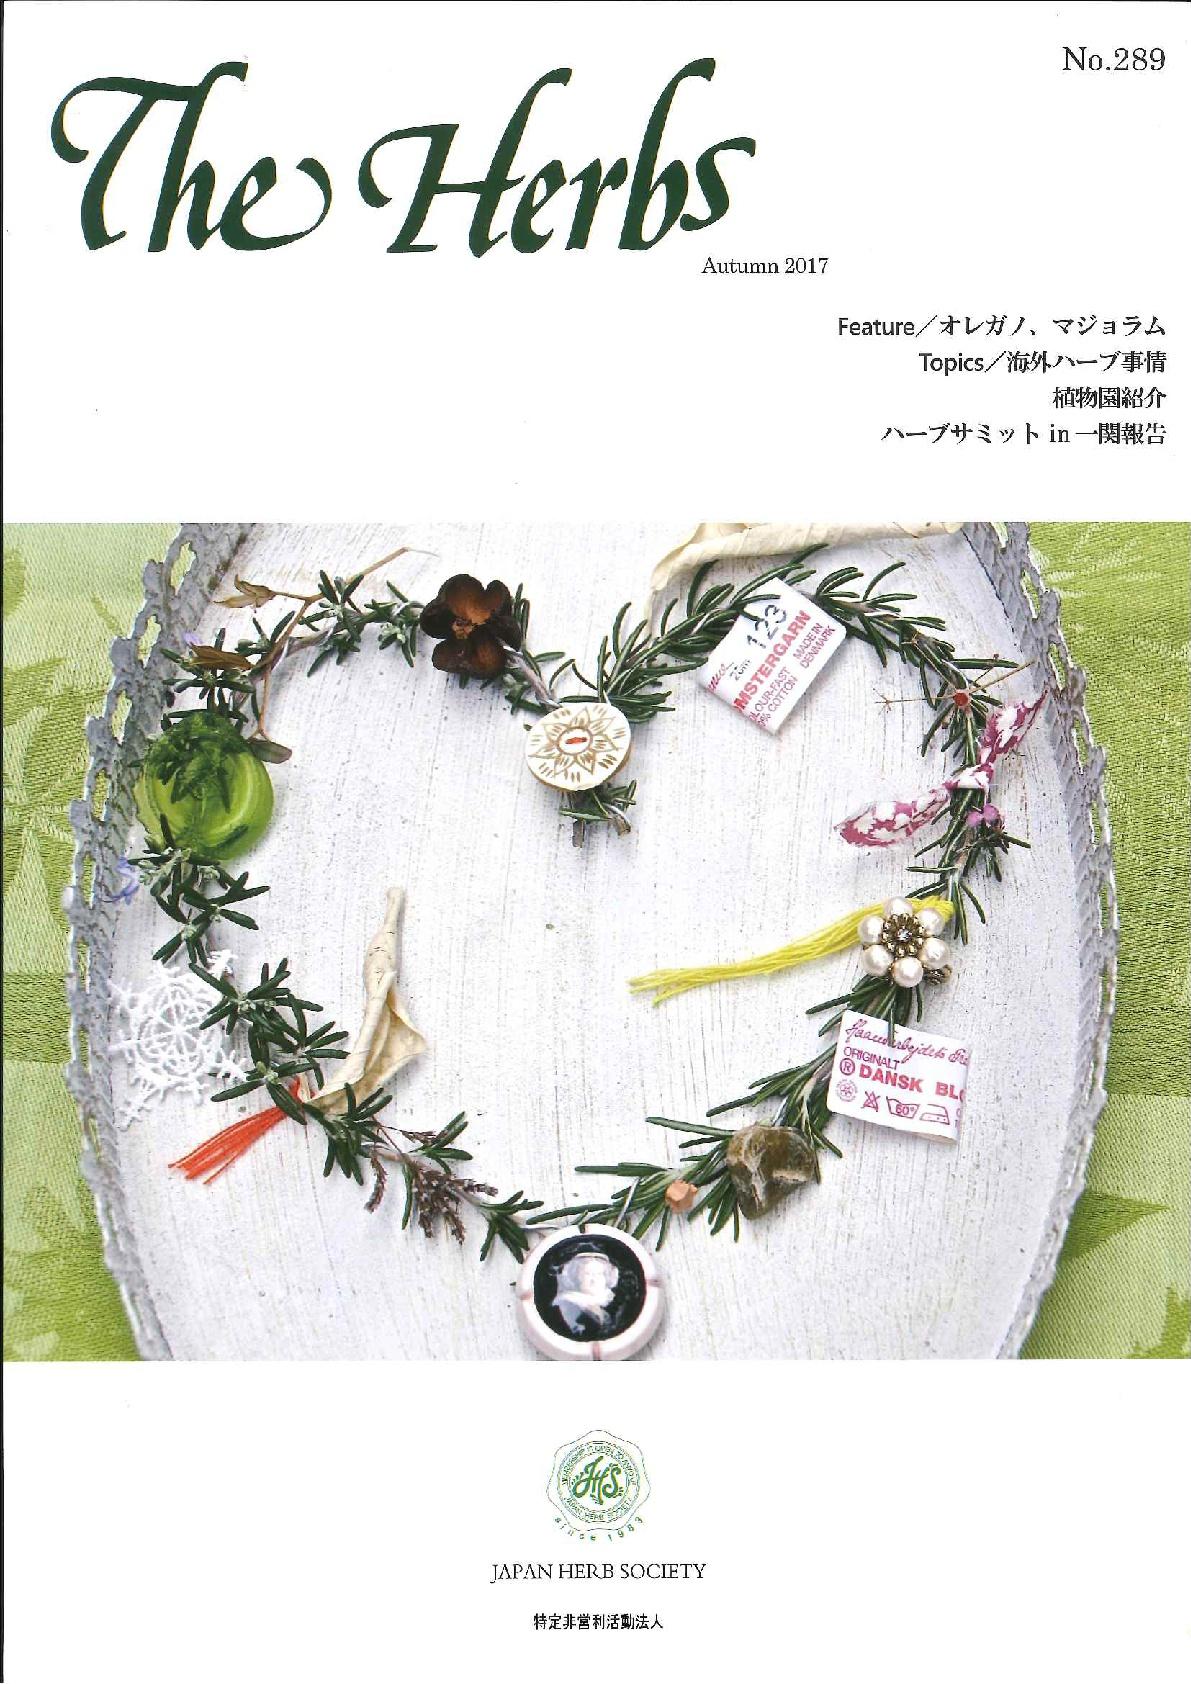 The Herbs 今月の会報誌